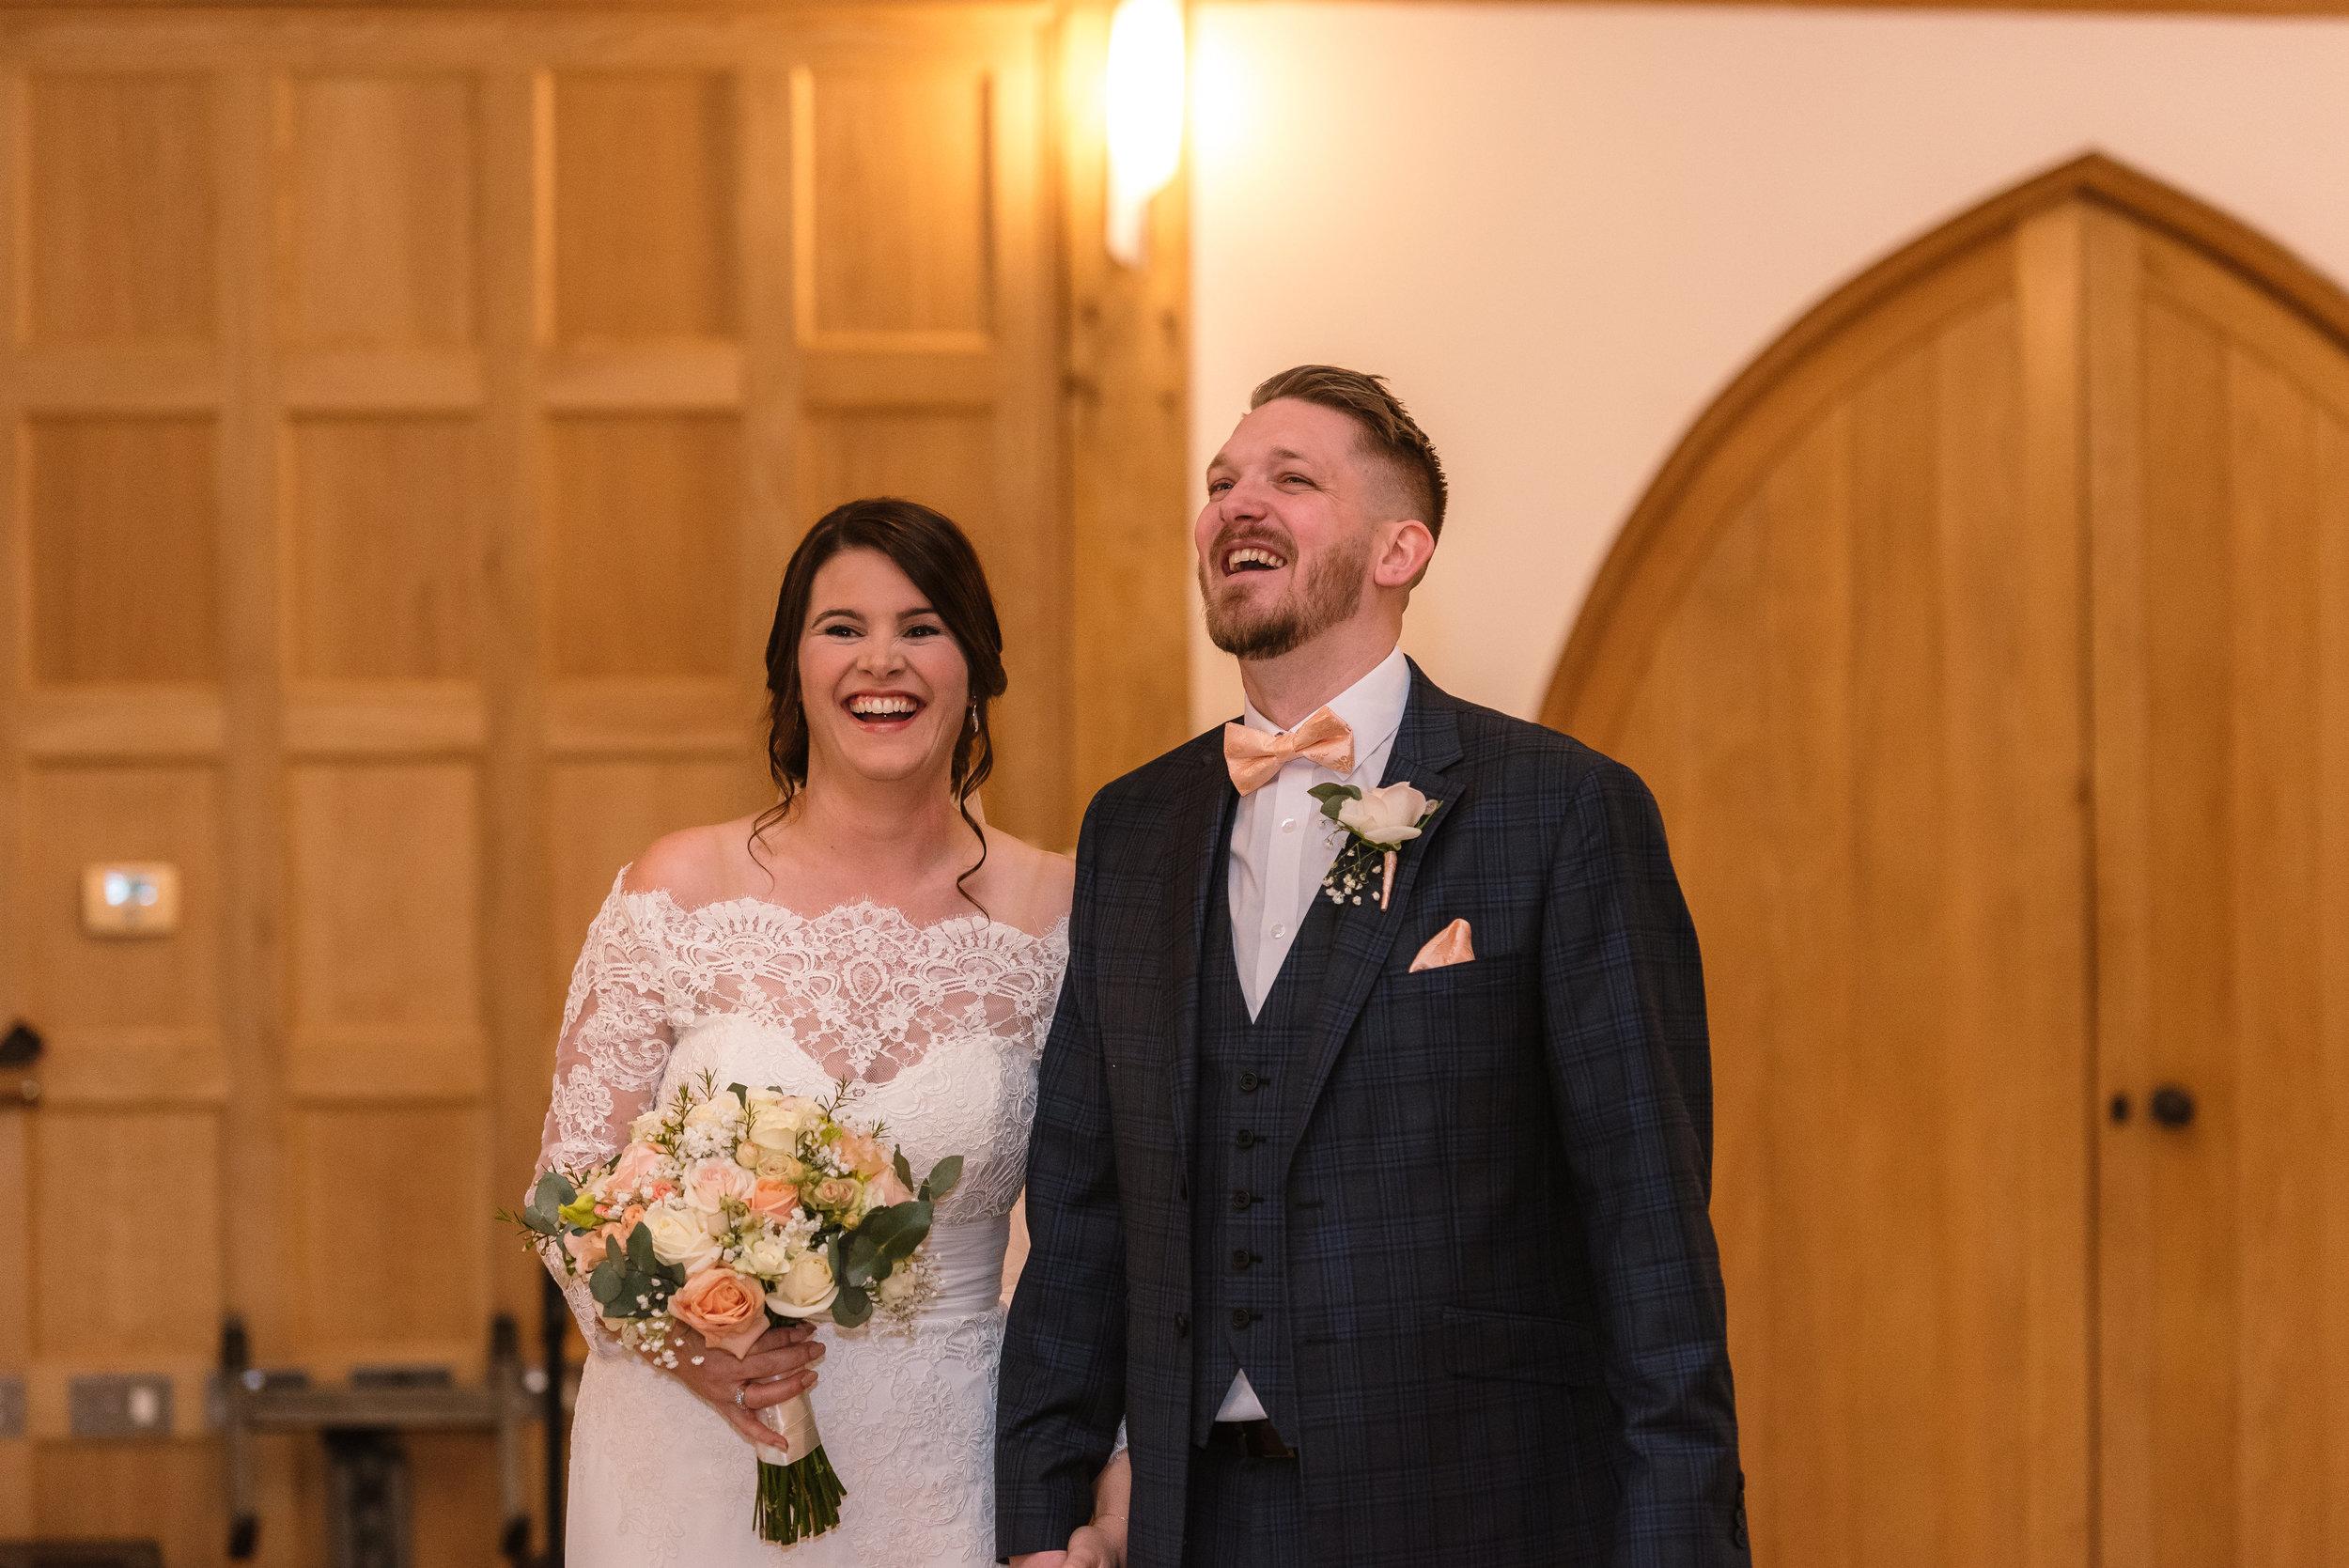 Sarah-Fishlock-Photography-Hampshire-wedding-photographer-hampshire / fleet-wedding-photographer-fleet /rivervale-barn / wedding-in-snow